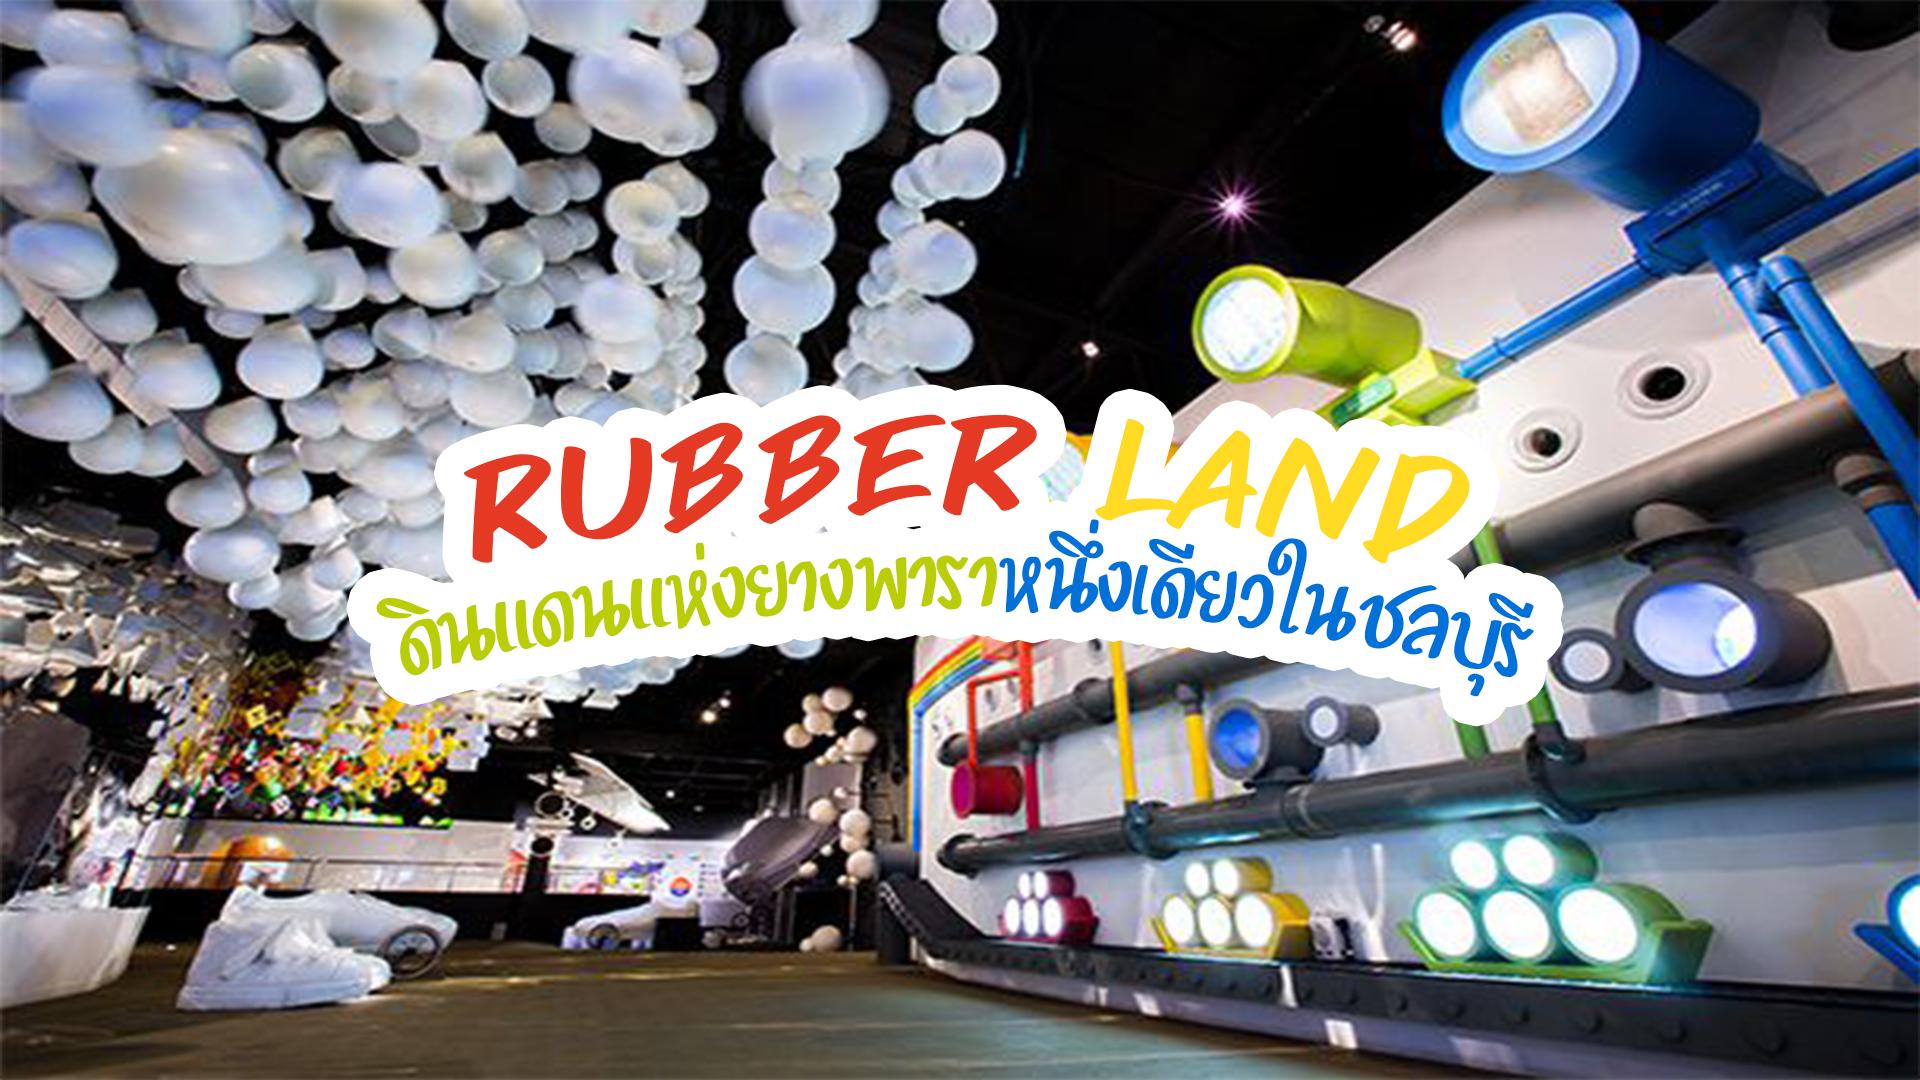 Rubber Land ดินแดนแห่งยางพาราหนึ่งเดียวในชลบุรี